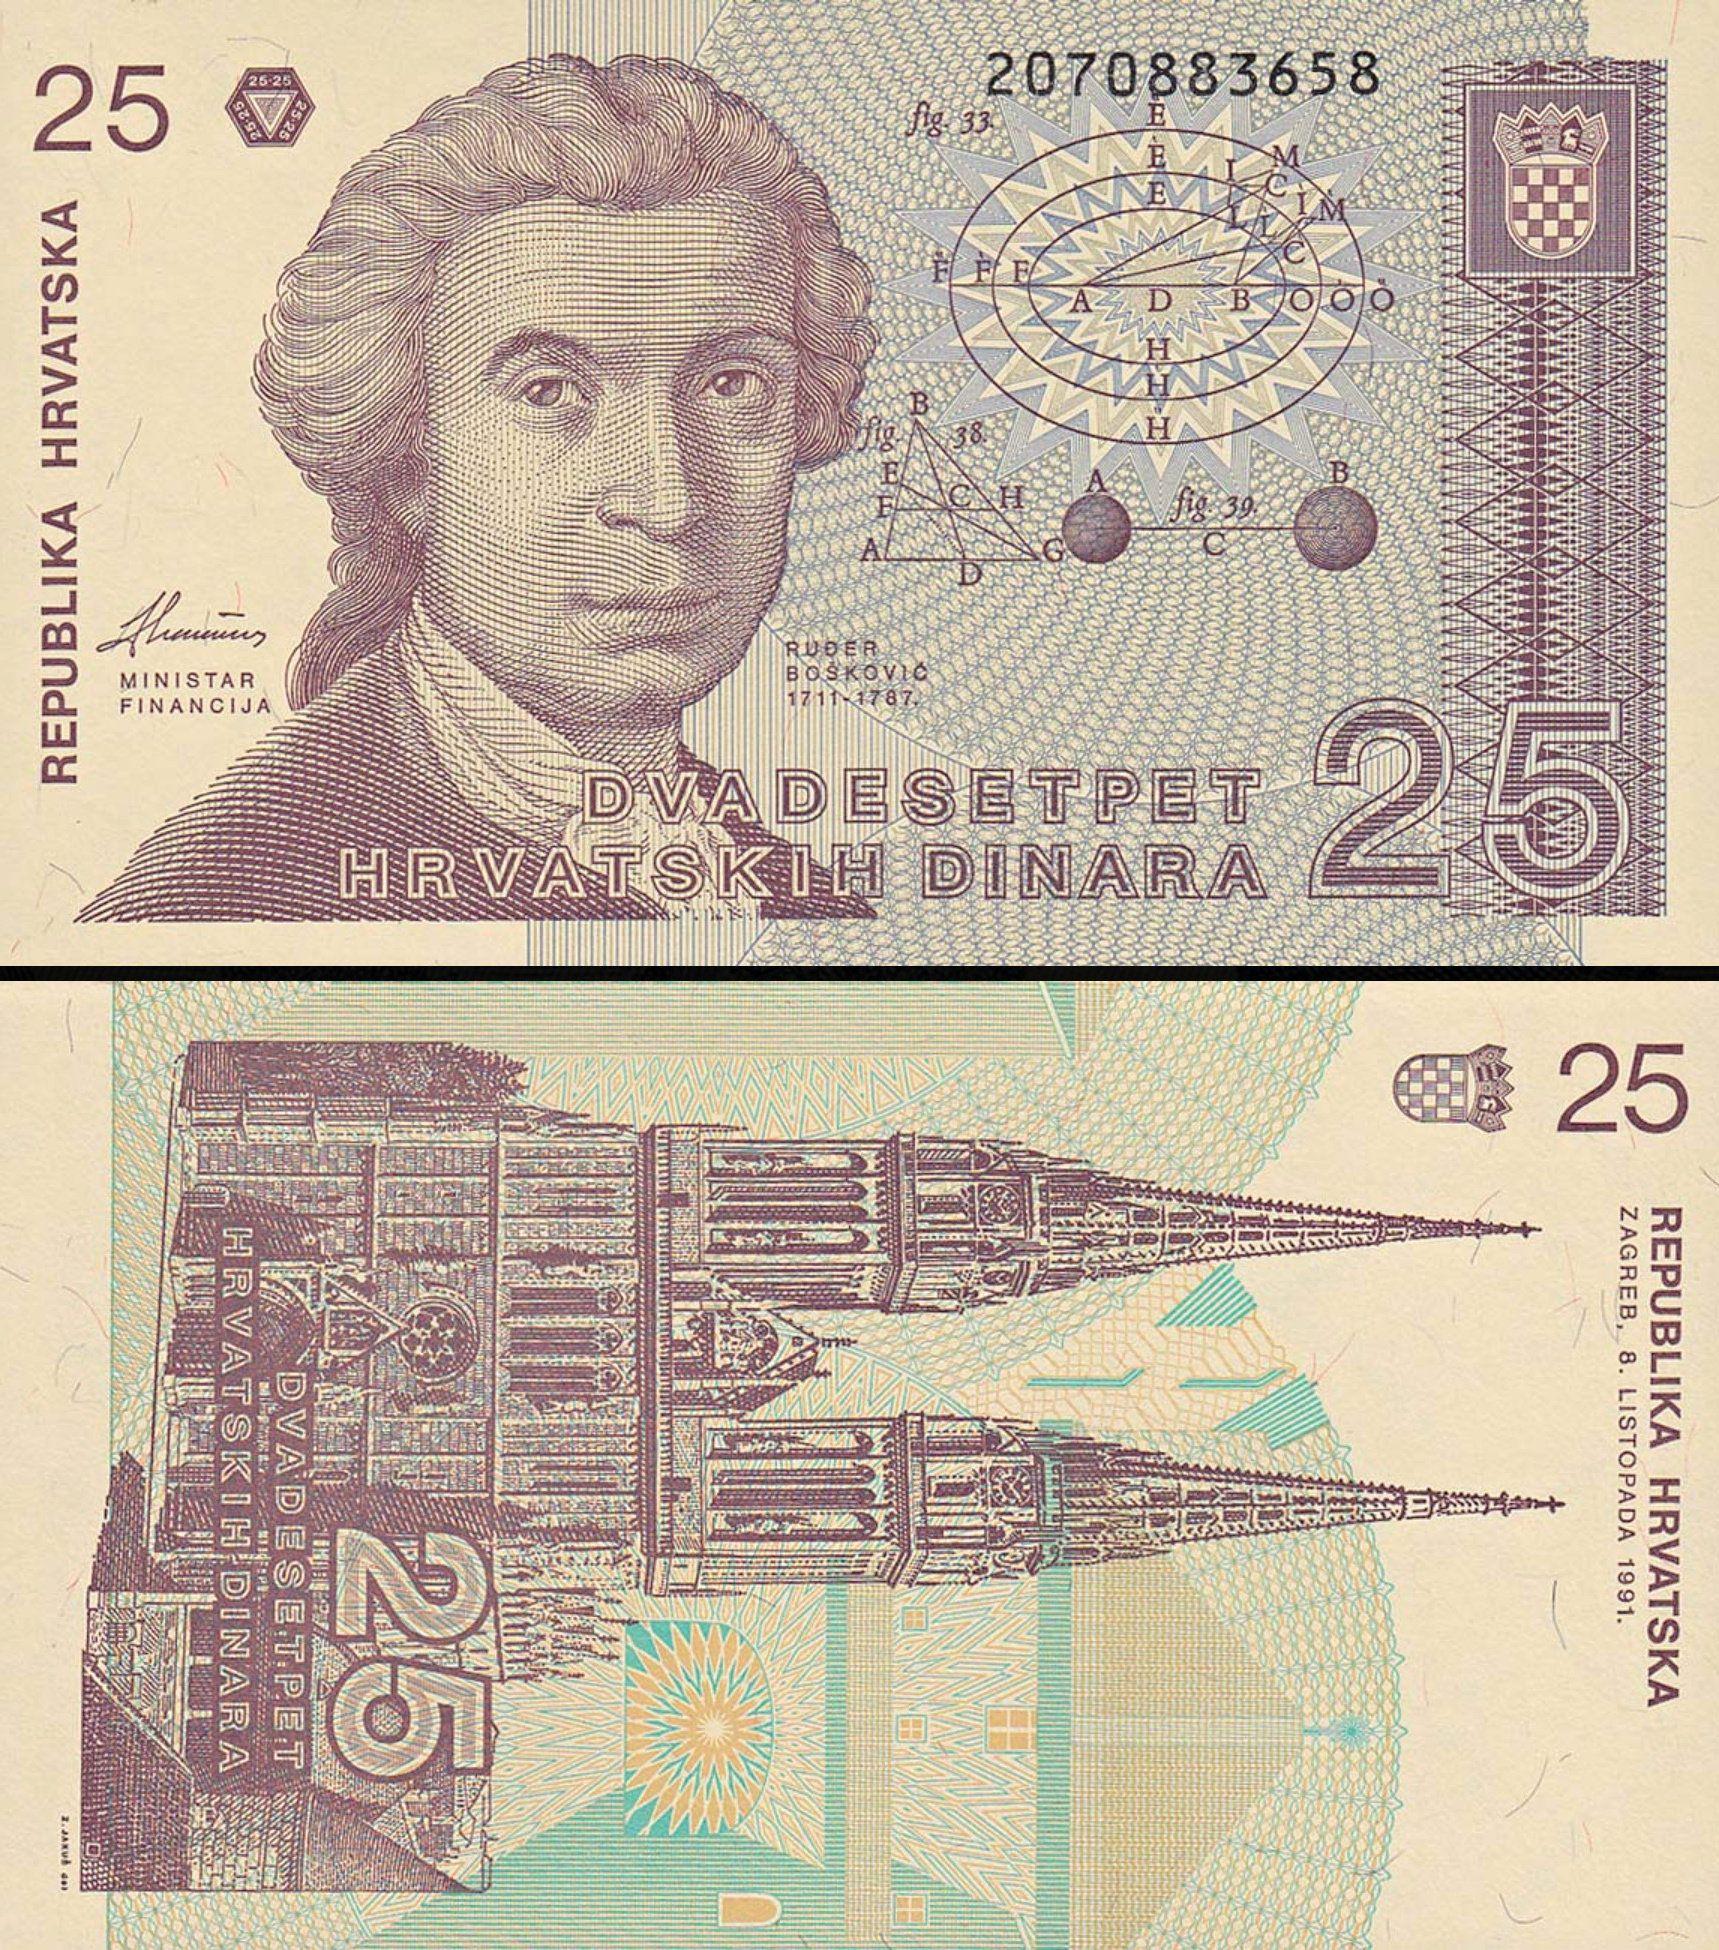 Croatia 25 Dinars 1991 Pick19 UNC, World Paper Money